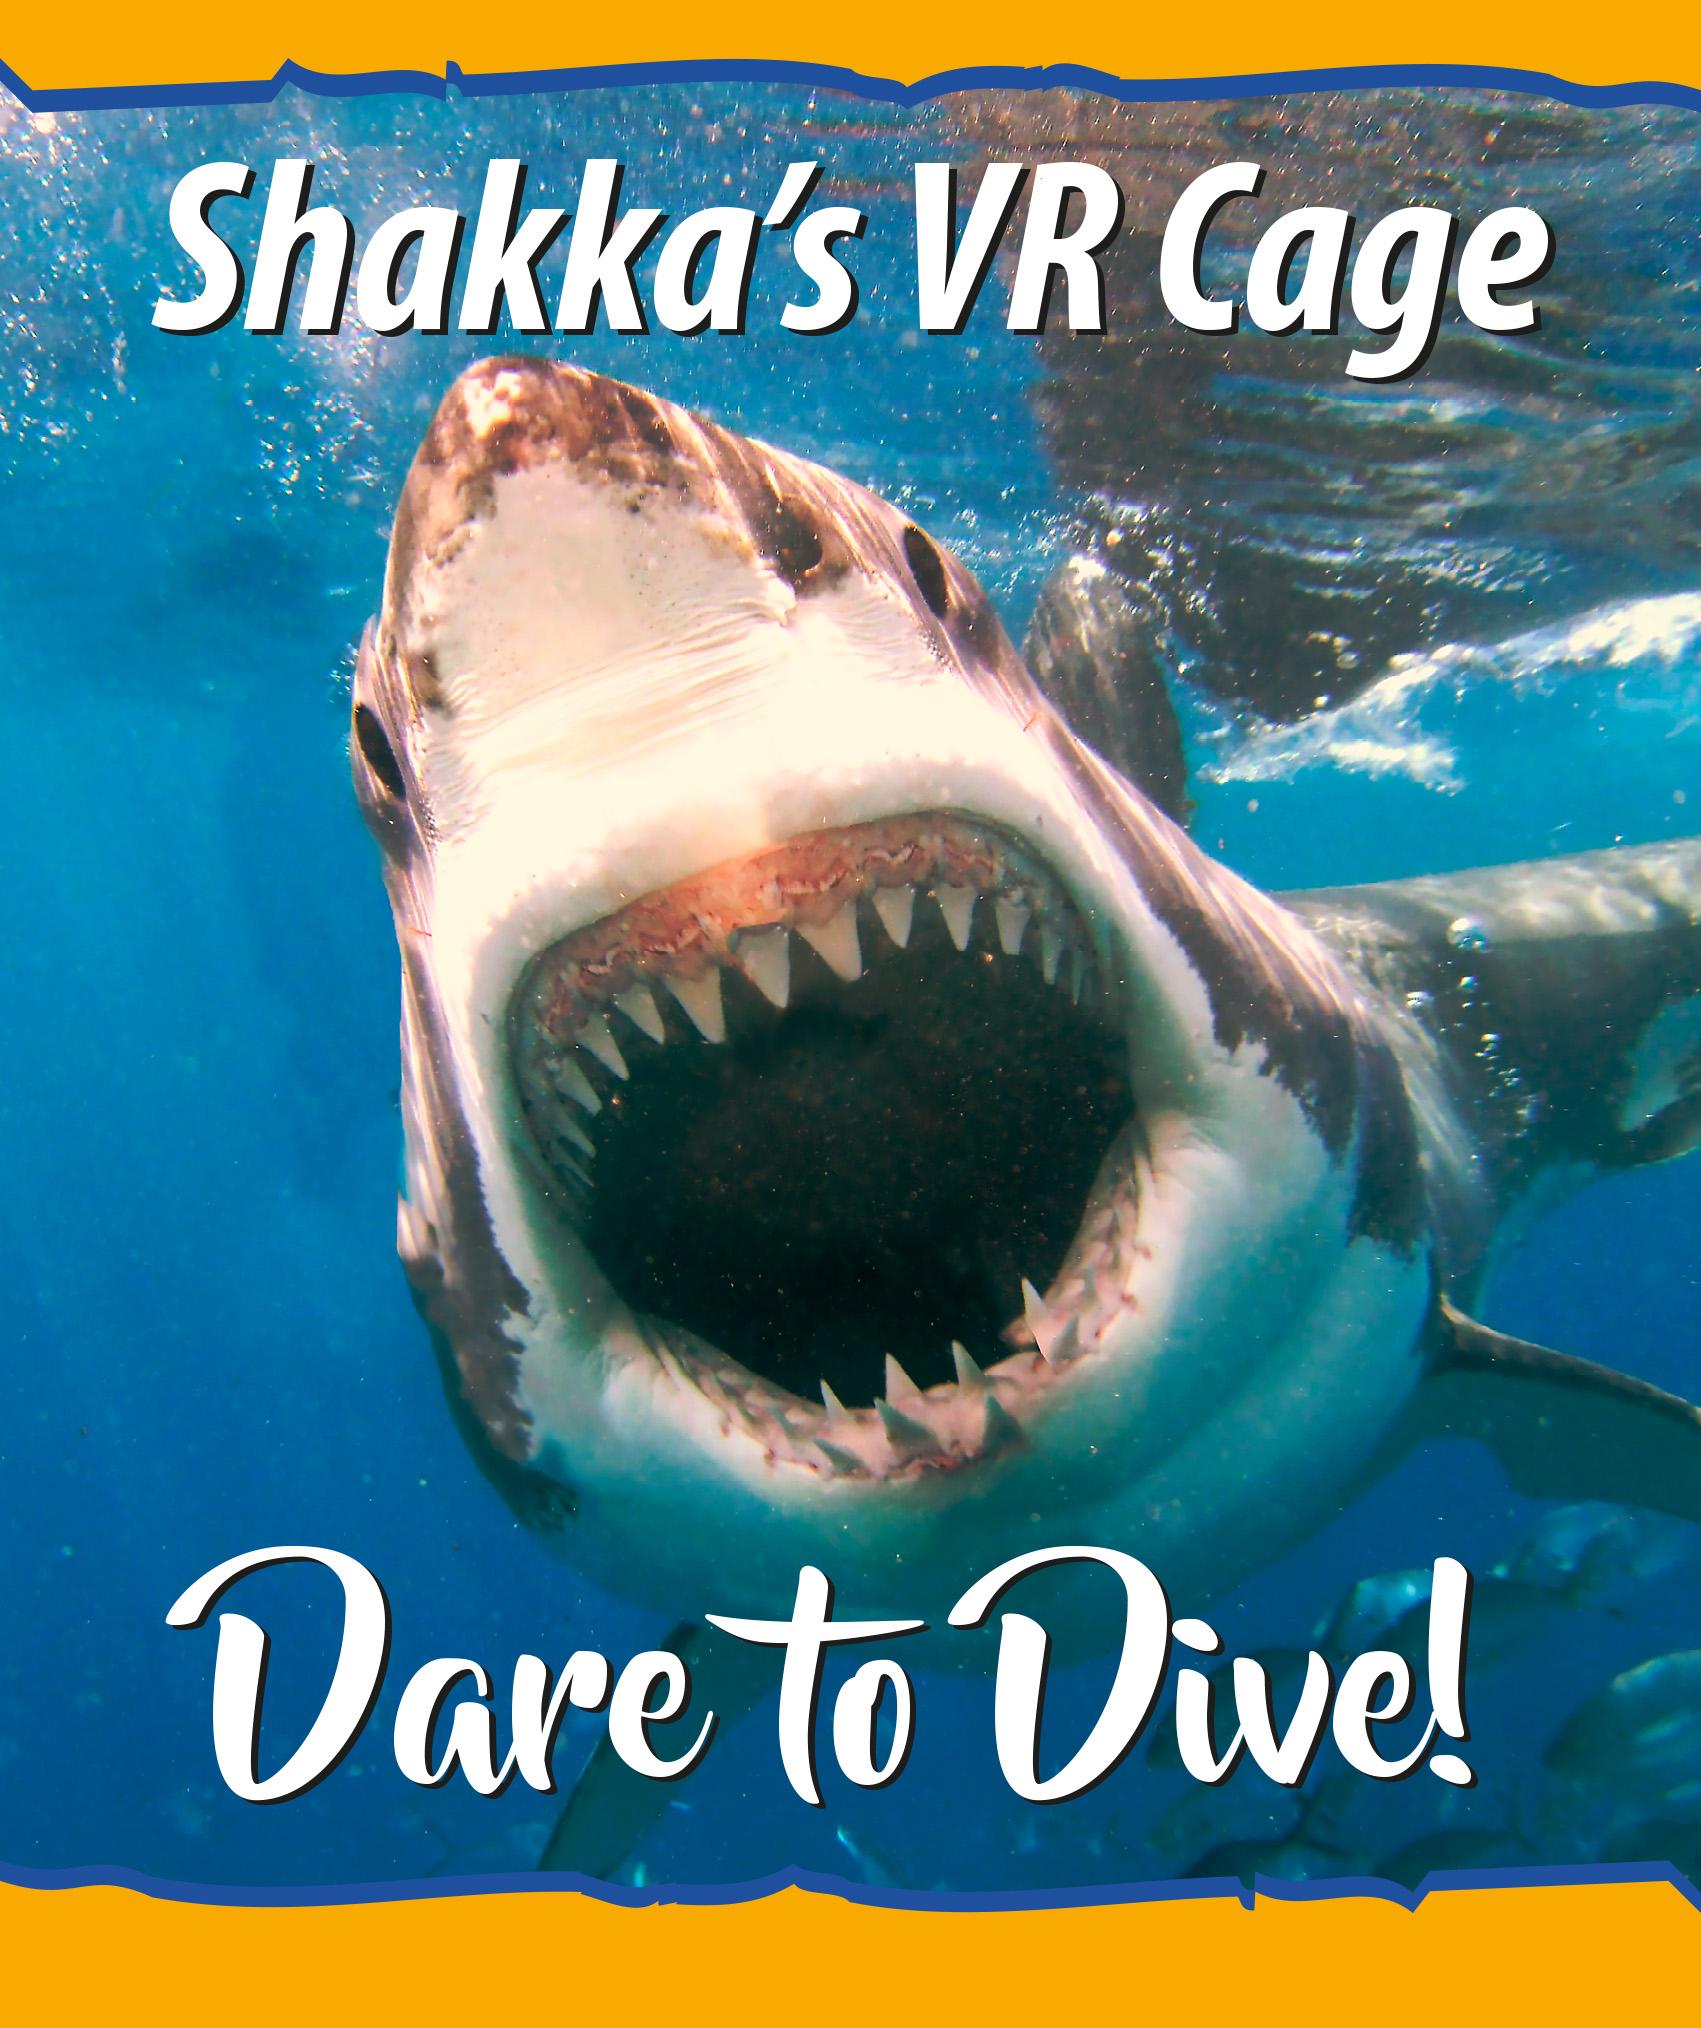 Shakka's VR Cage